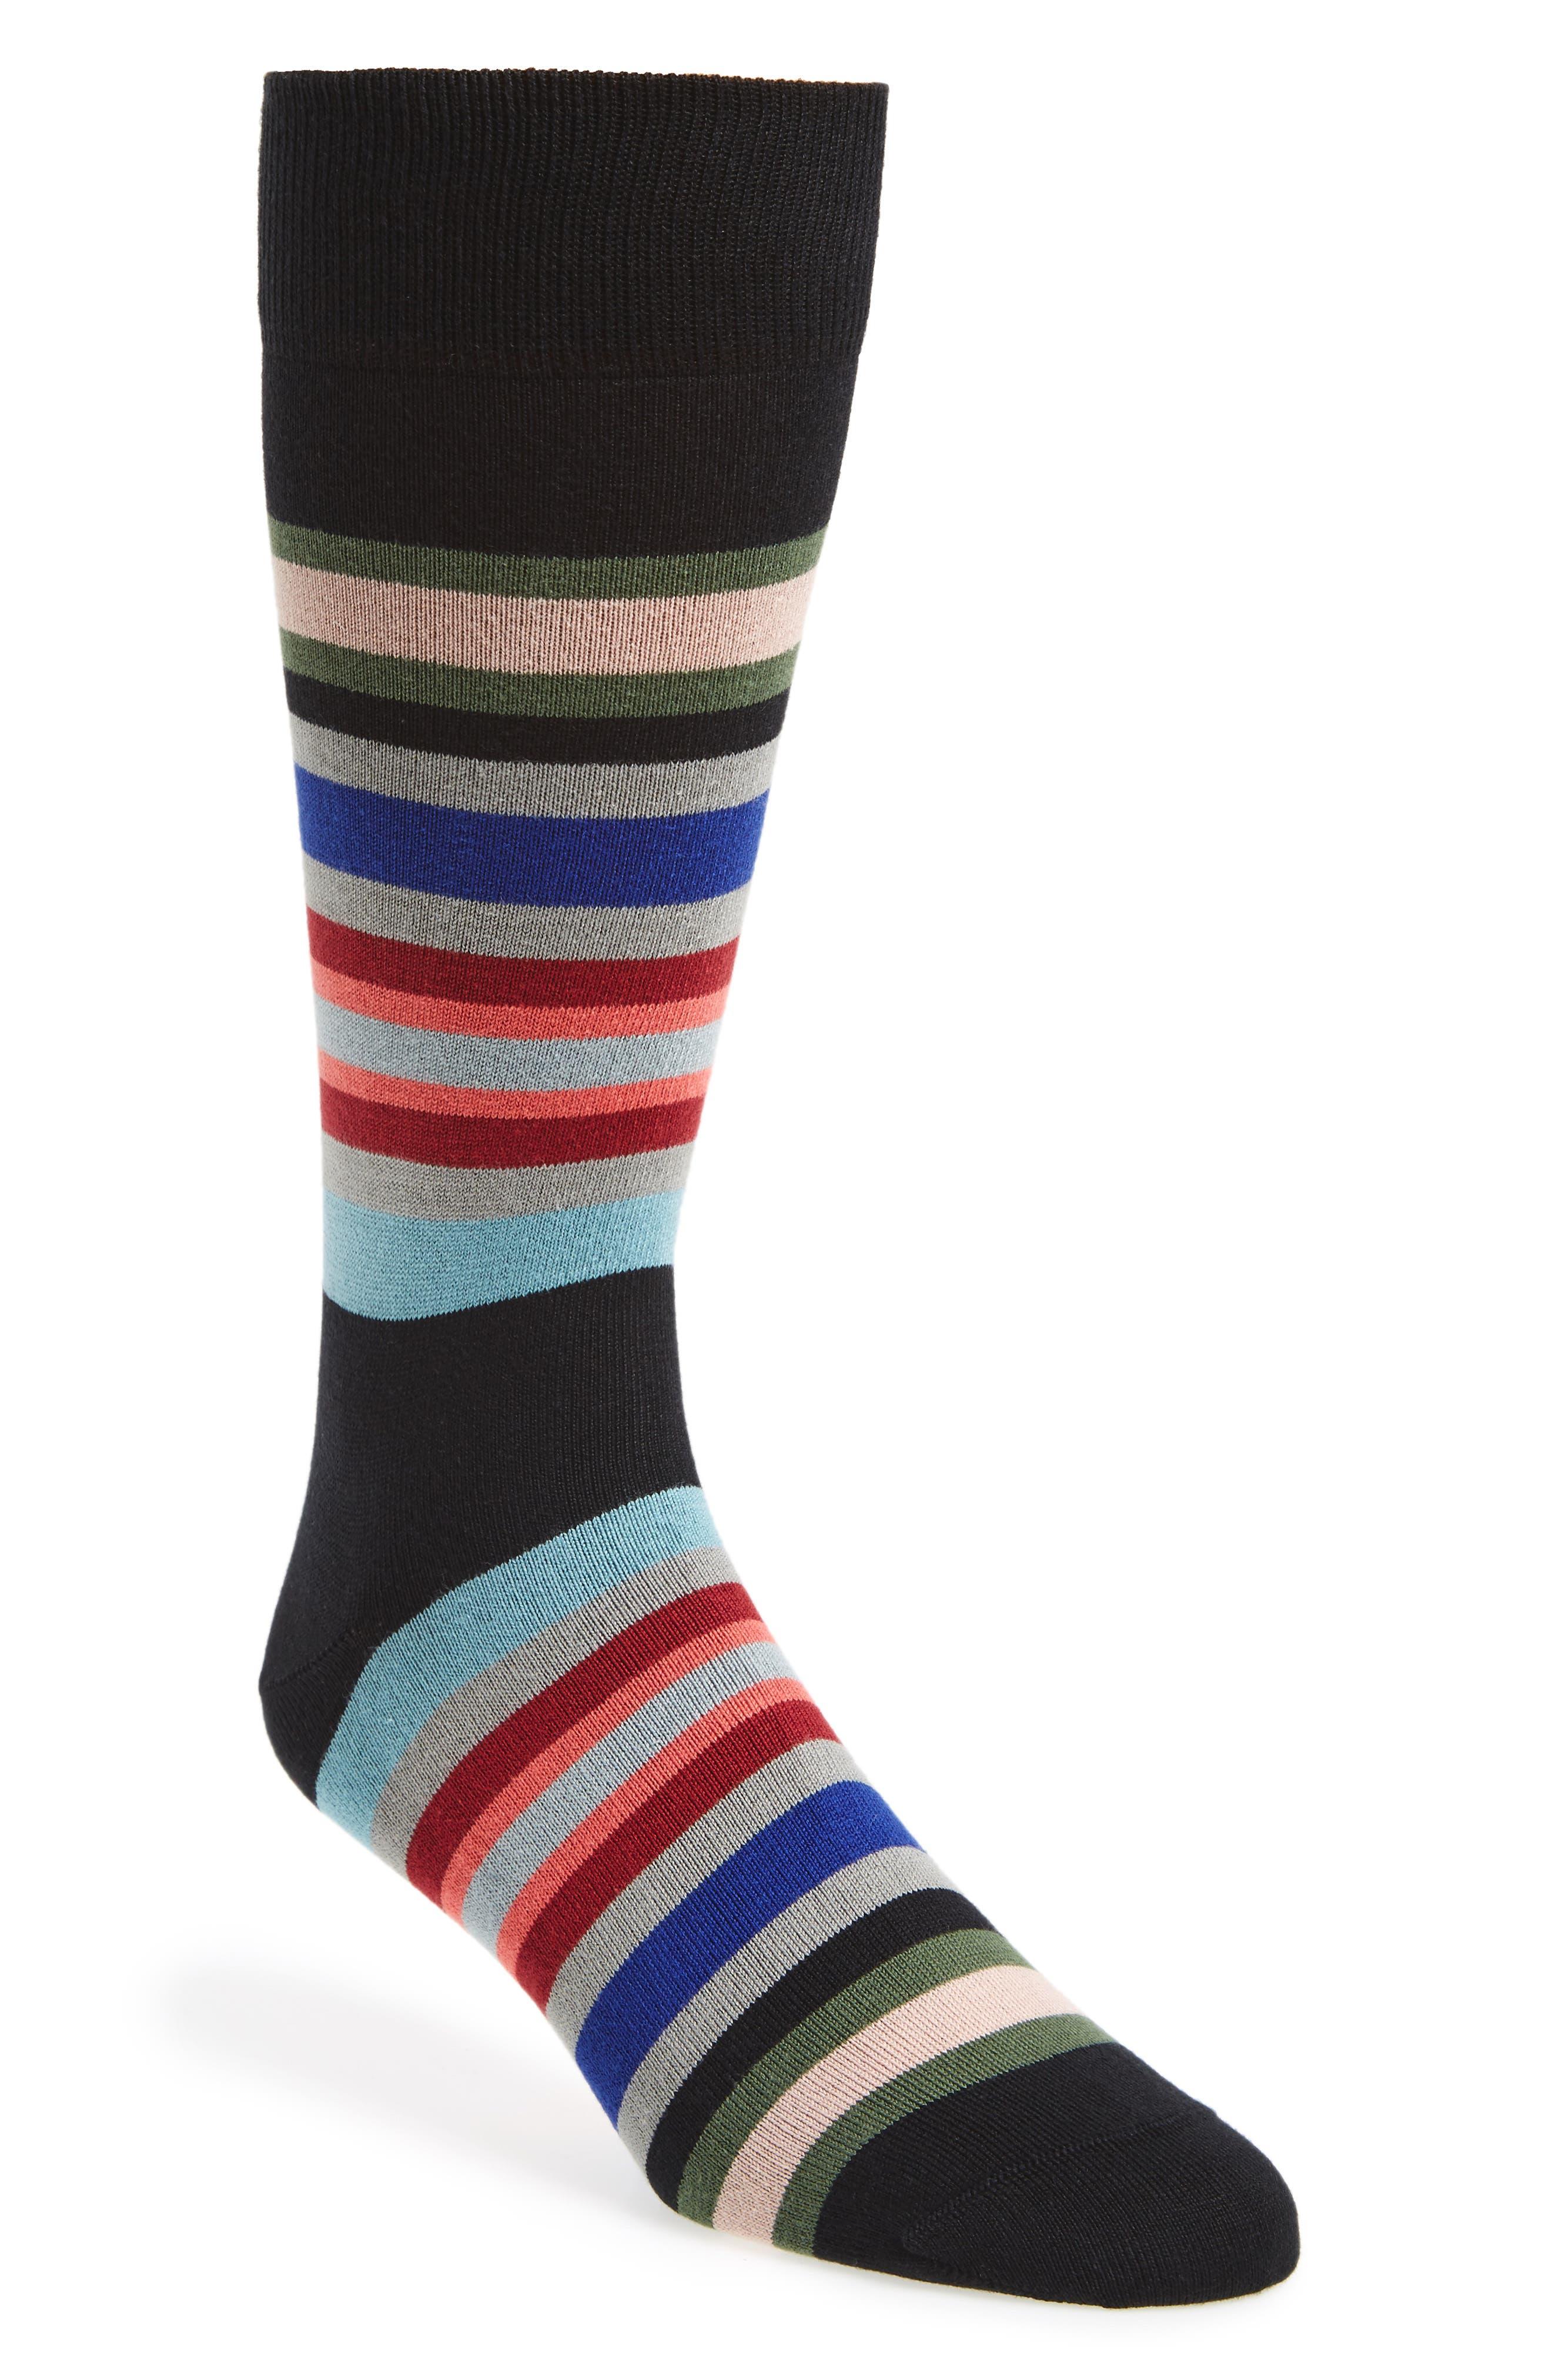 Alternate Image 1 Selected - Paul Smith Kew Stripe Socks